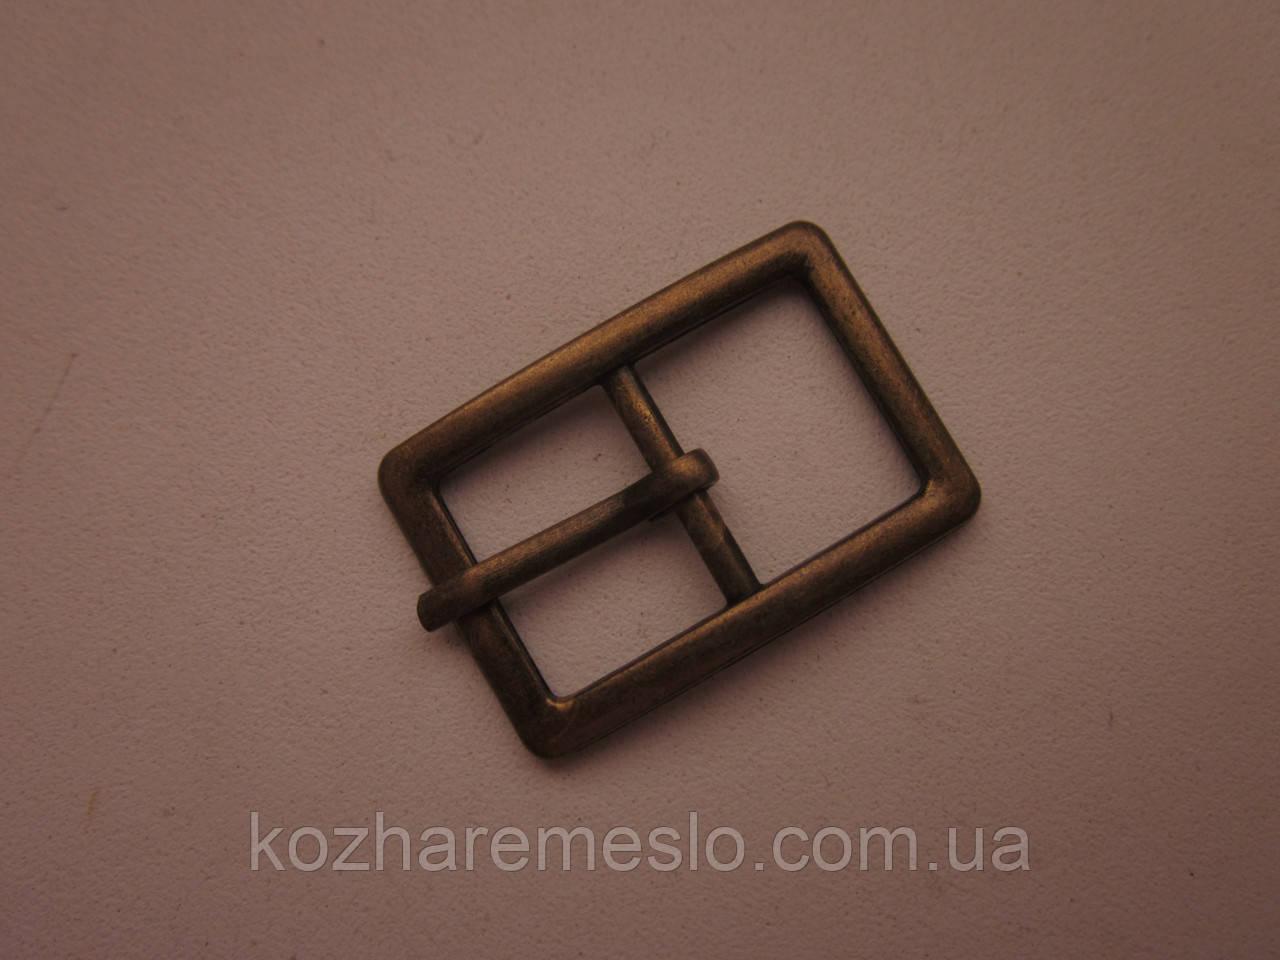 Пряжка 15.3 мм антик